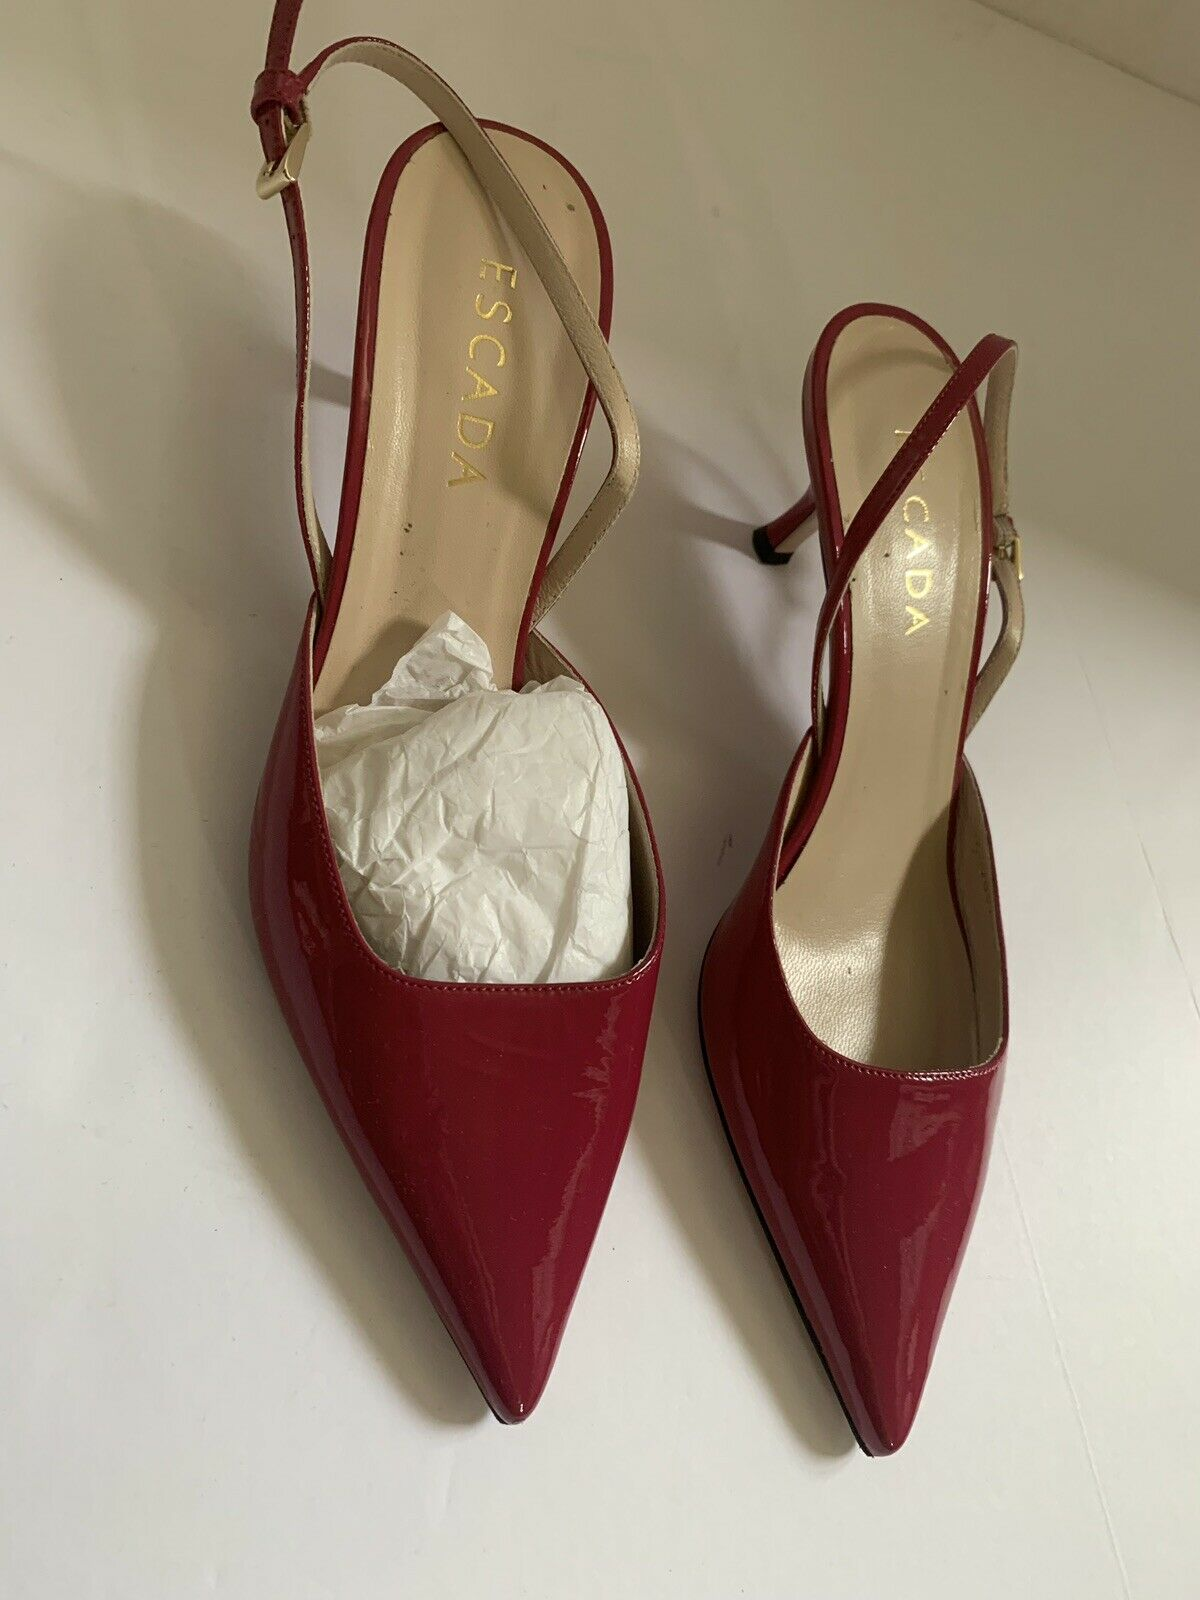 Escada Pump Patent Leather Mauve Point Toe shoes Kitten Heel Size 39 US 9